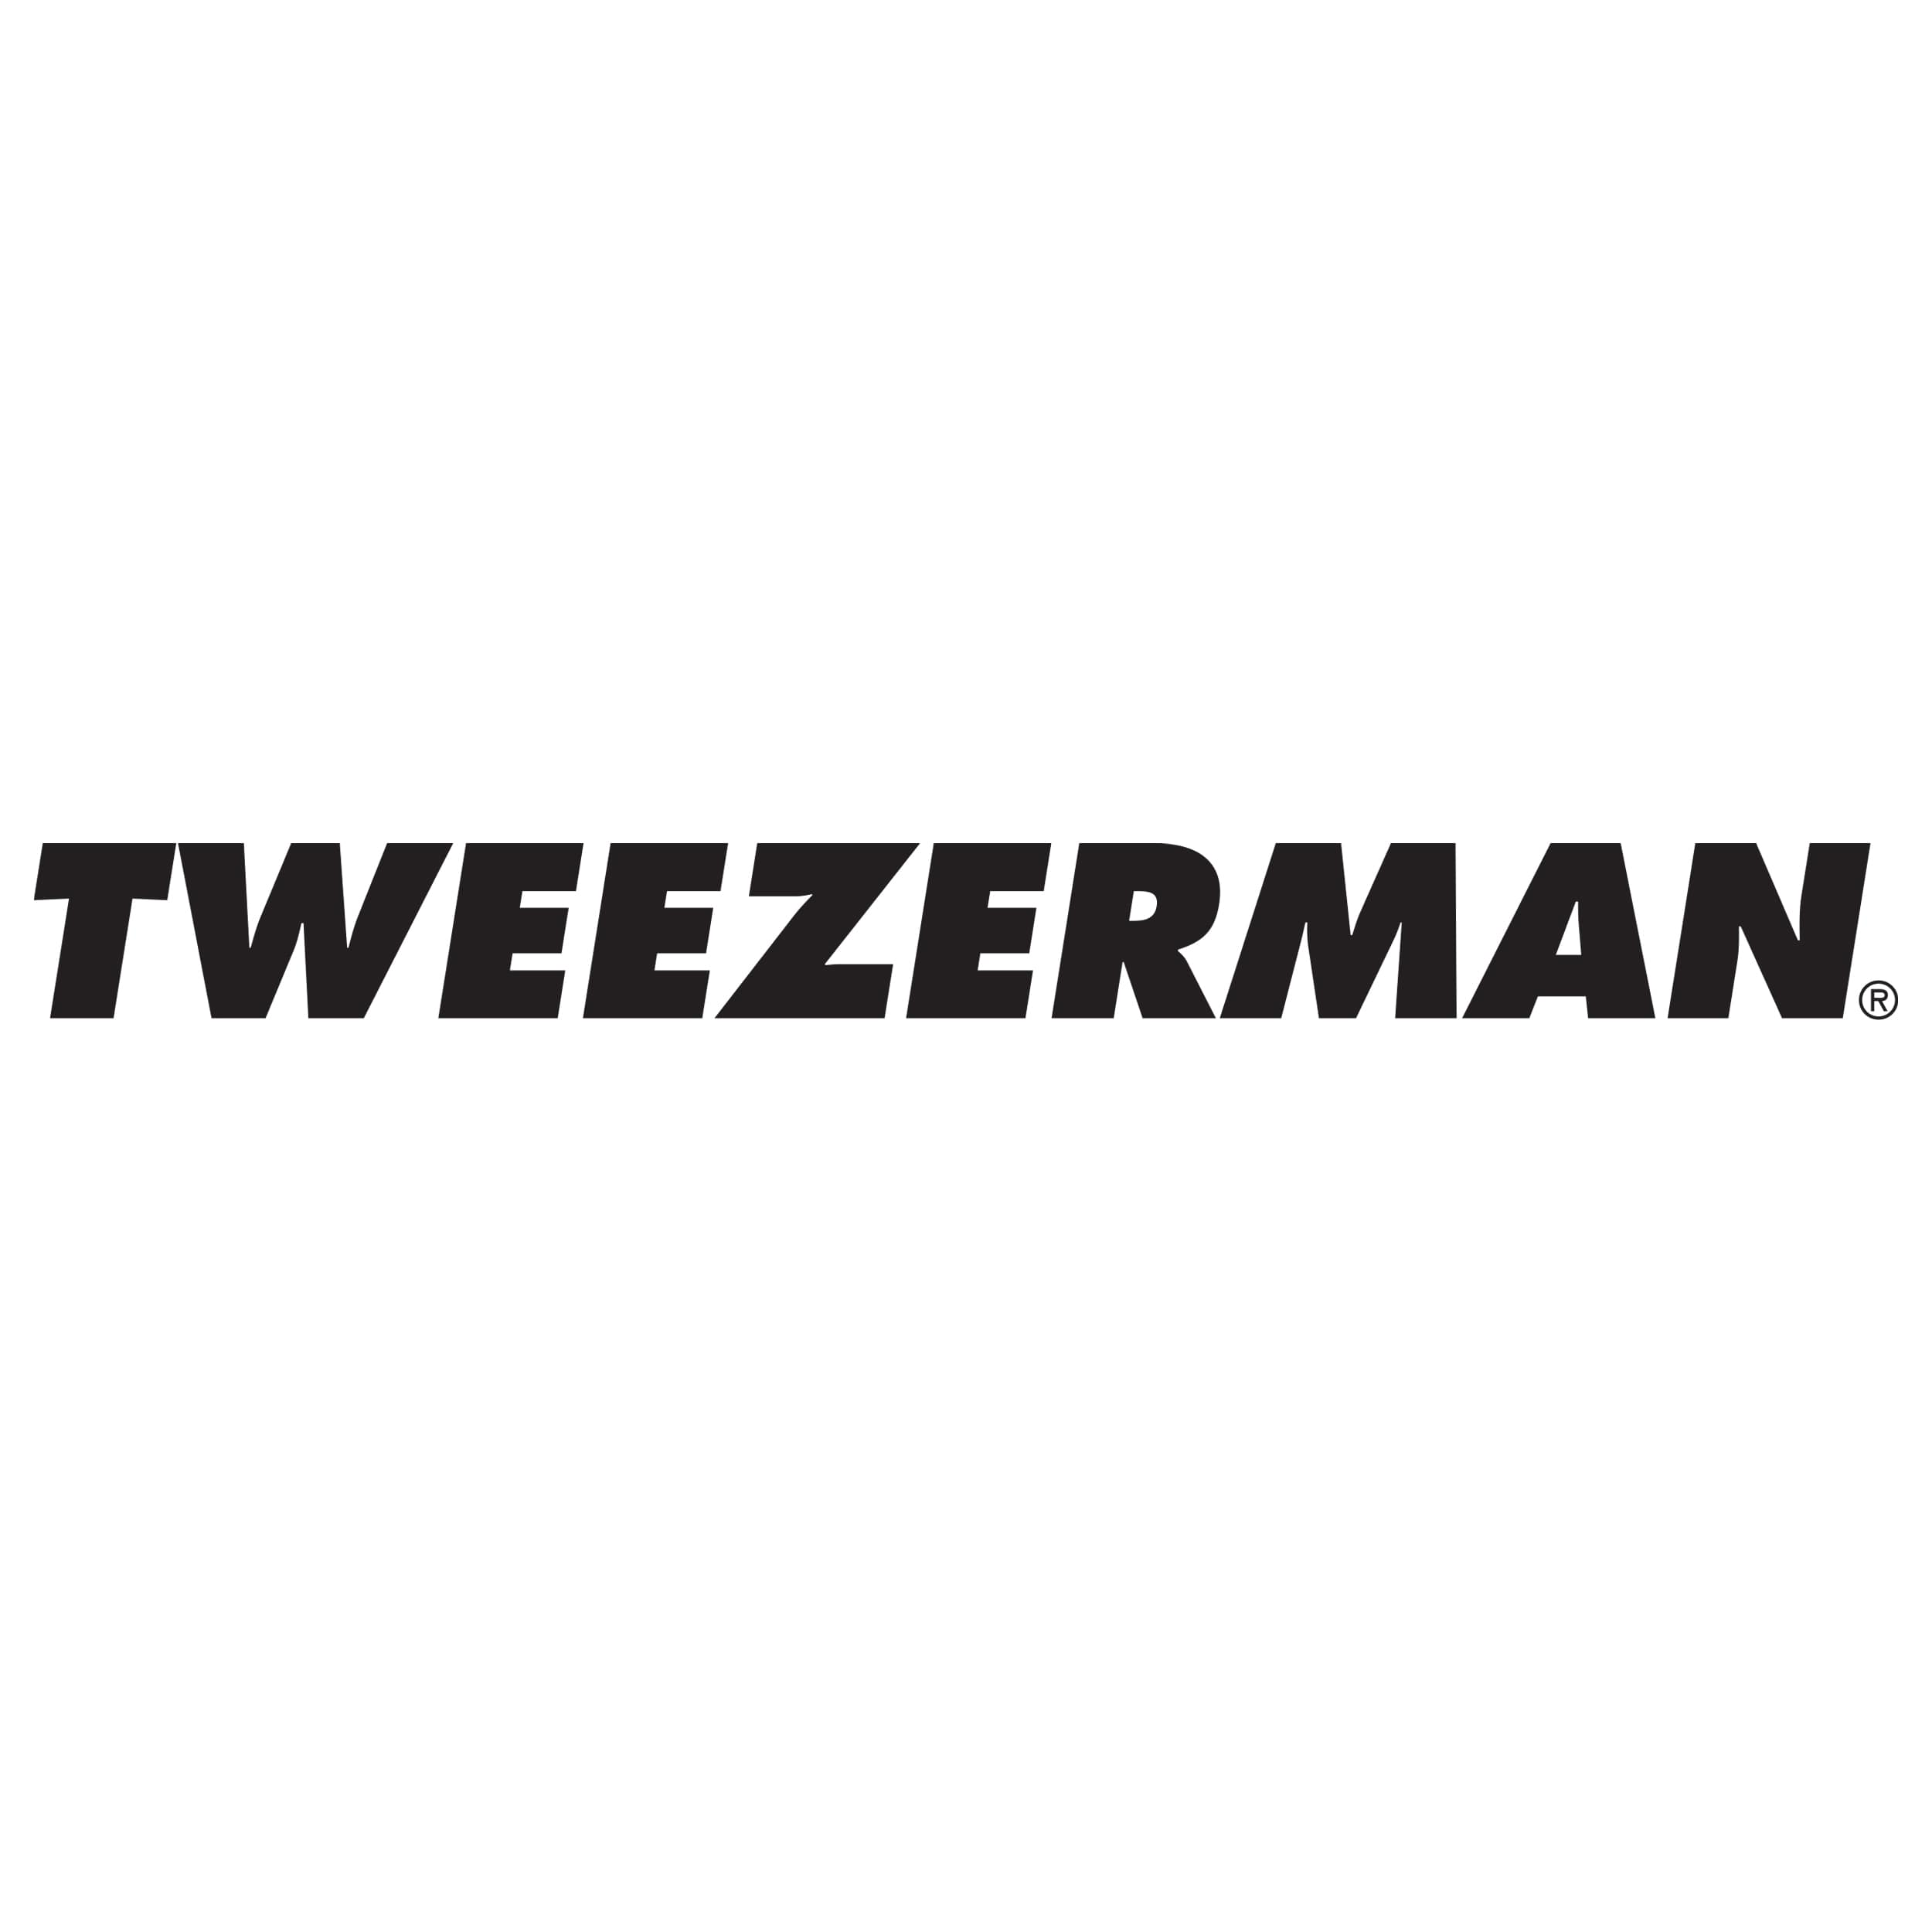 tweezerman eyelash curler. tweezerman eyelash curler